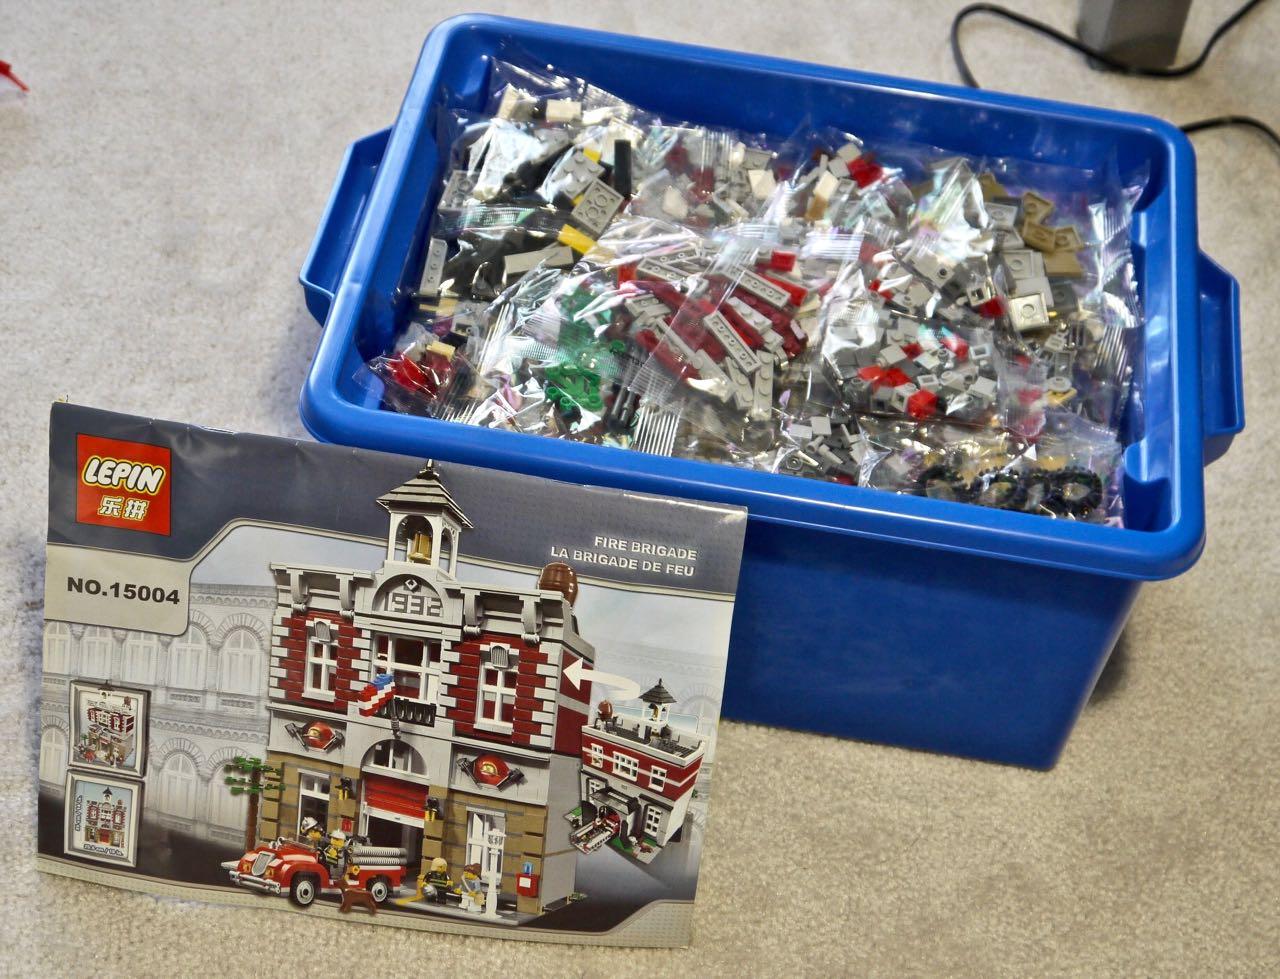 Promo Lego 10197 Exclusive Modular Building Fire Brigade Terbaru Mesin Poles Shine Mate Ep800 Ep801 Its Not Lepin 15004 Review Part 1